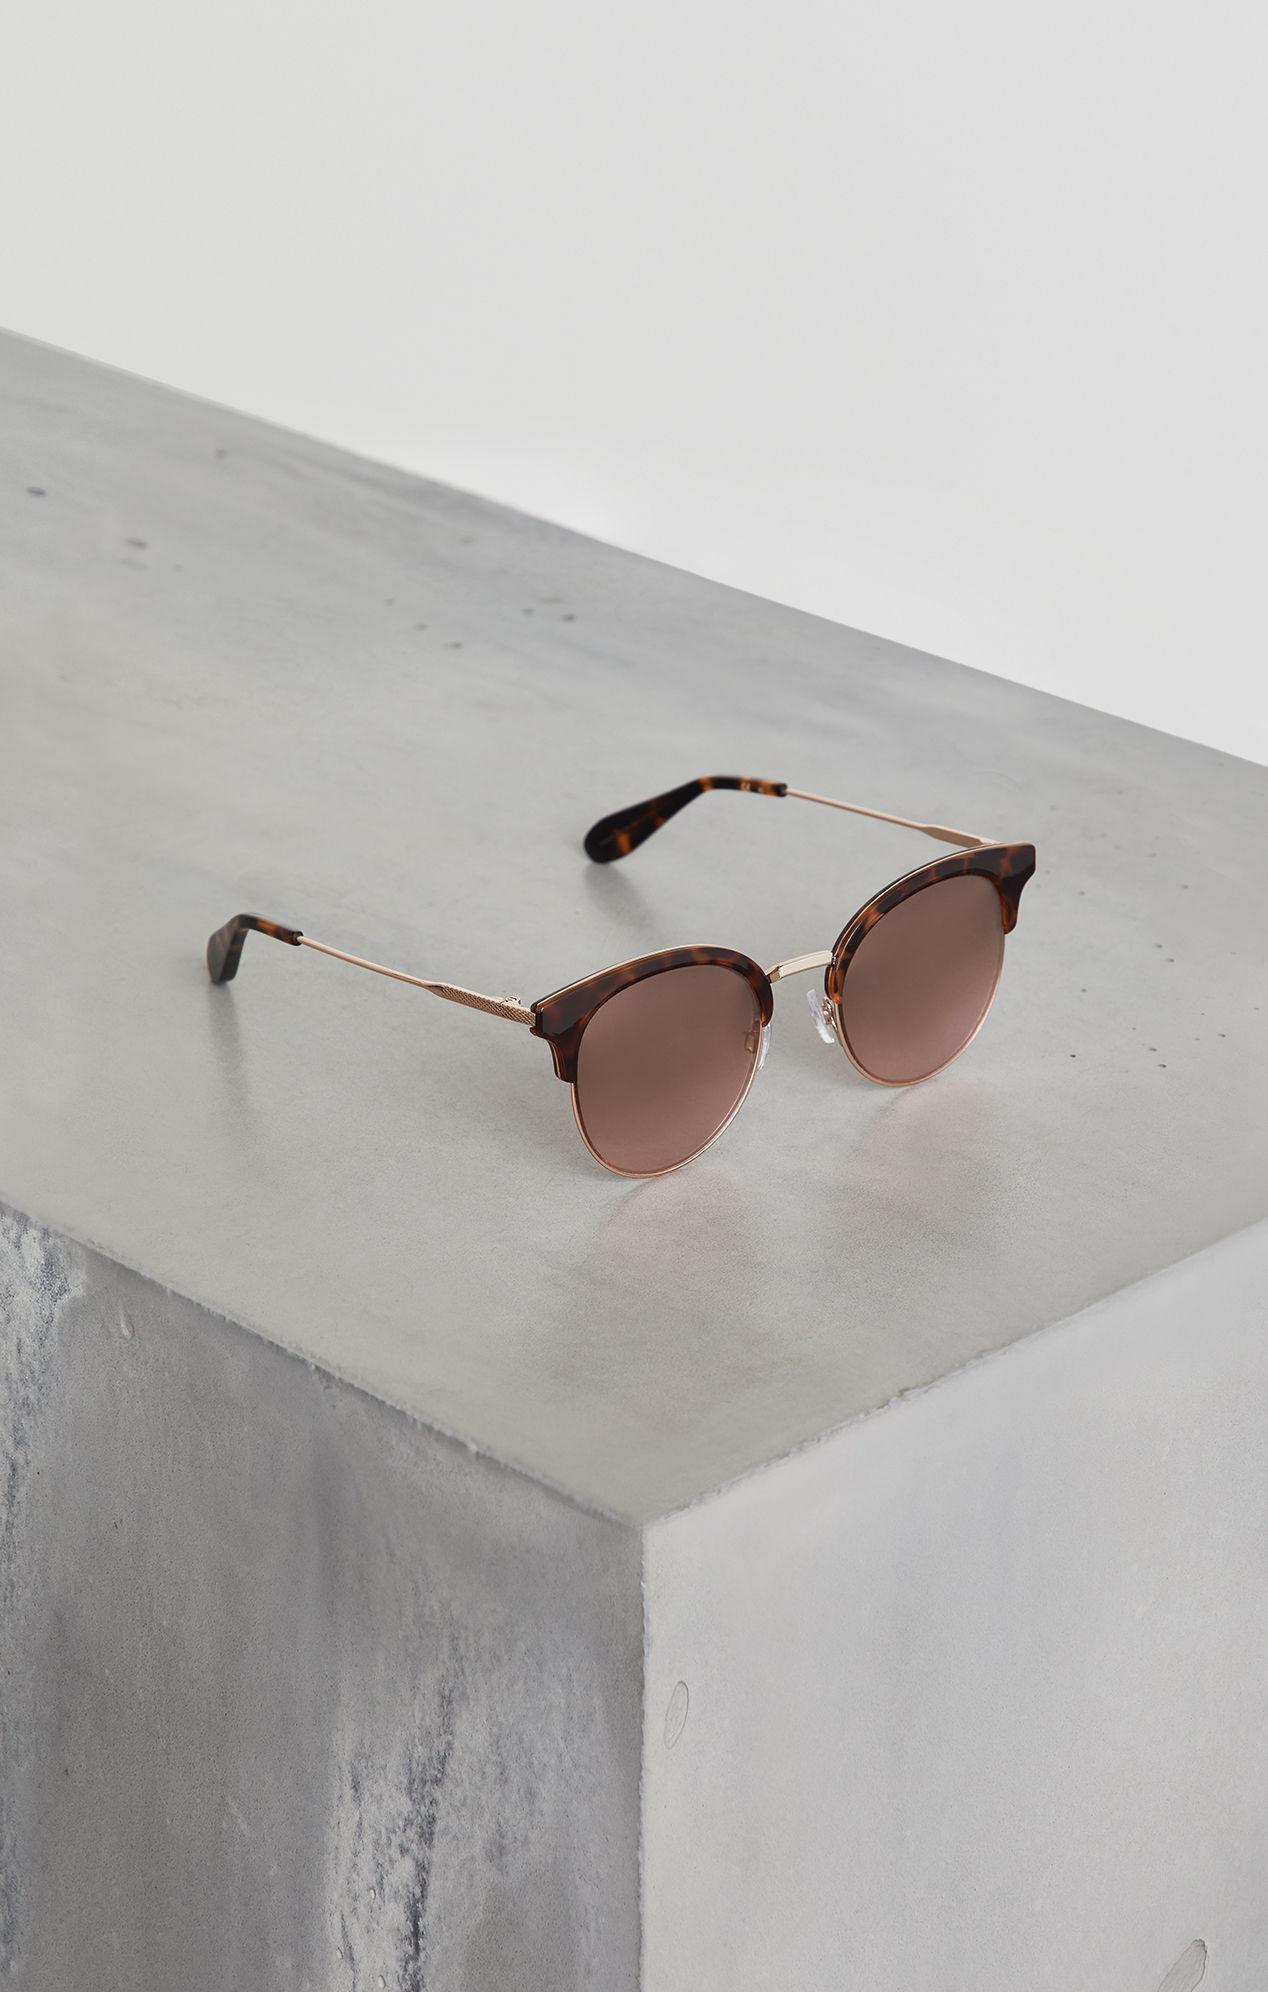 d8fc2f5010 Lyst - Bcbgmaxazria Bcbg Cat Eye Combo Sunglasses in White